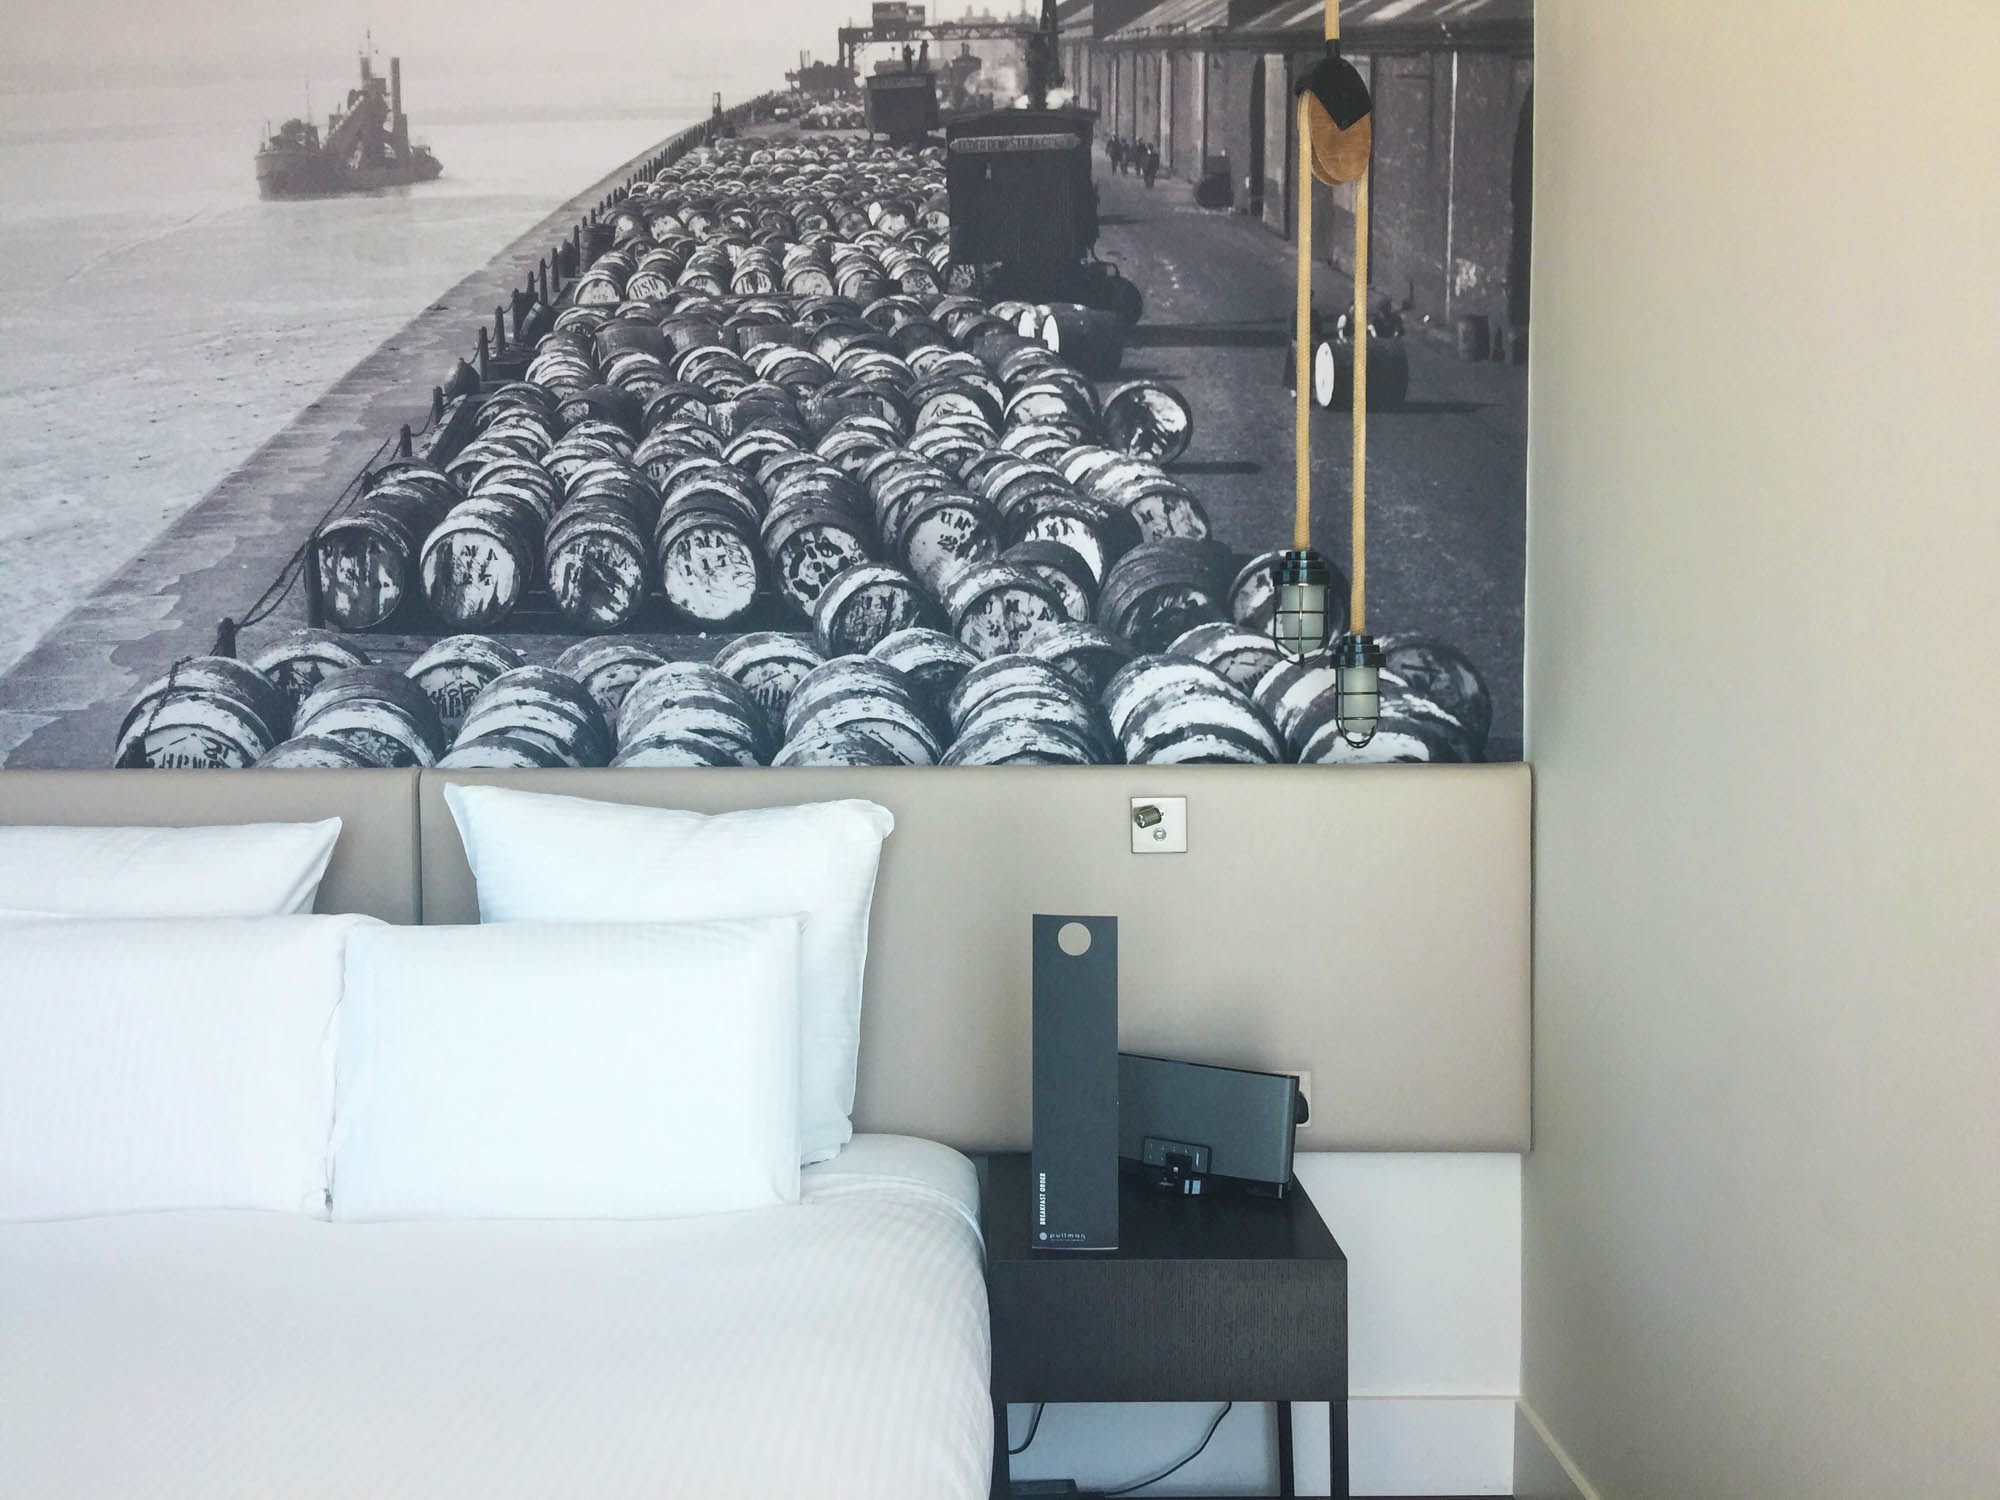 Best hotels in Liverpoo l- Pullman Liverpool